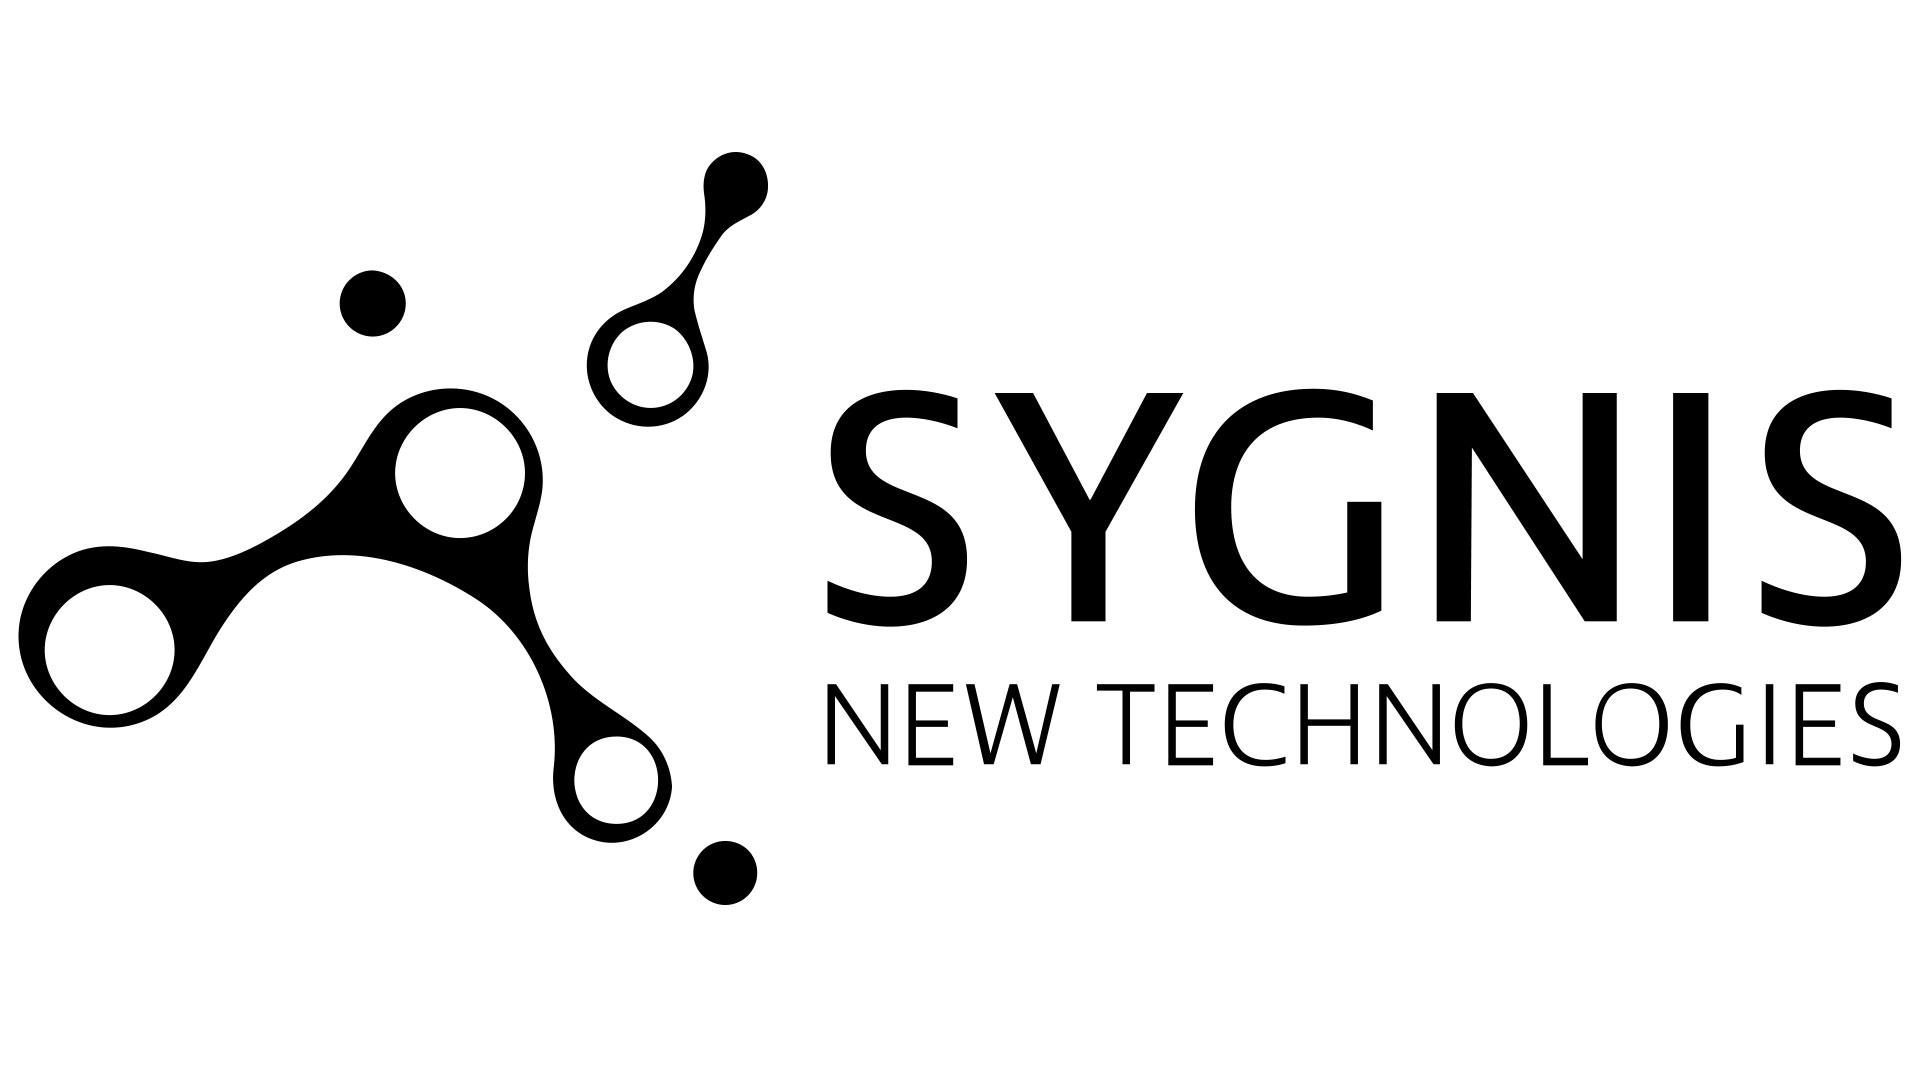 SYGPAST project begins development of a hybrid 3D printer prototype